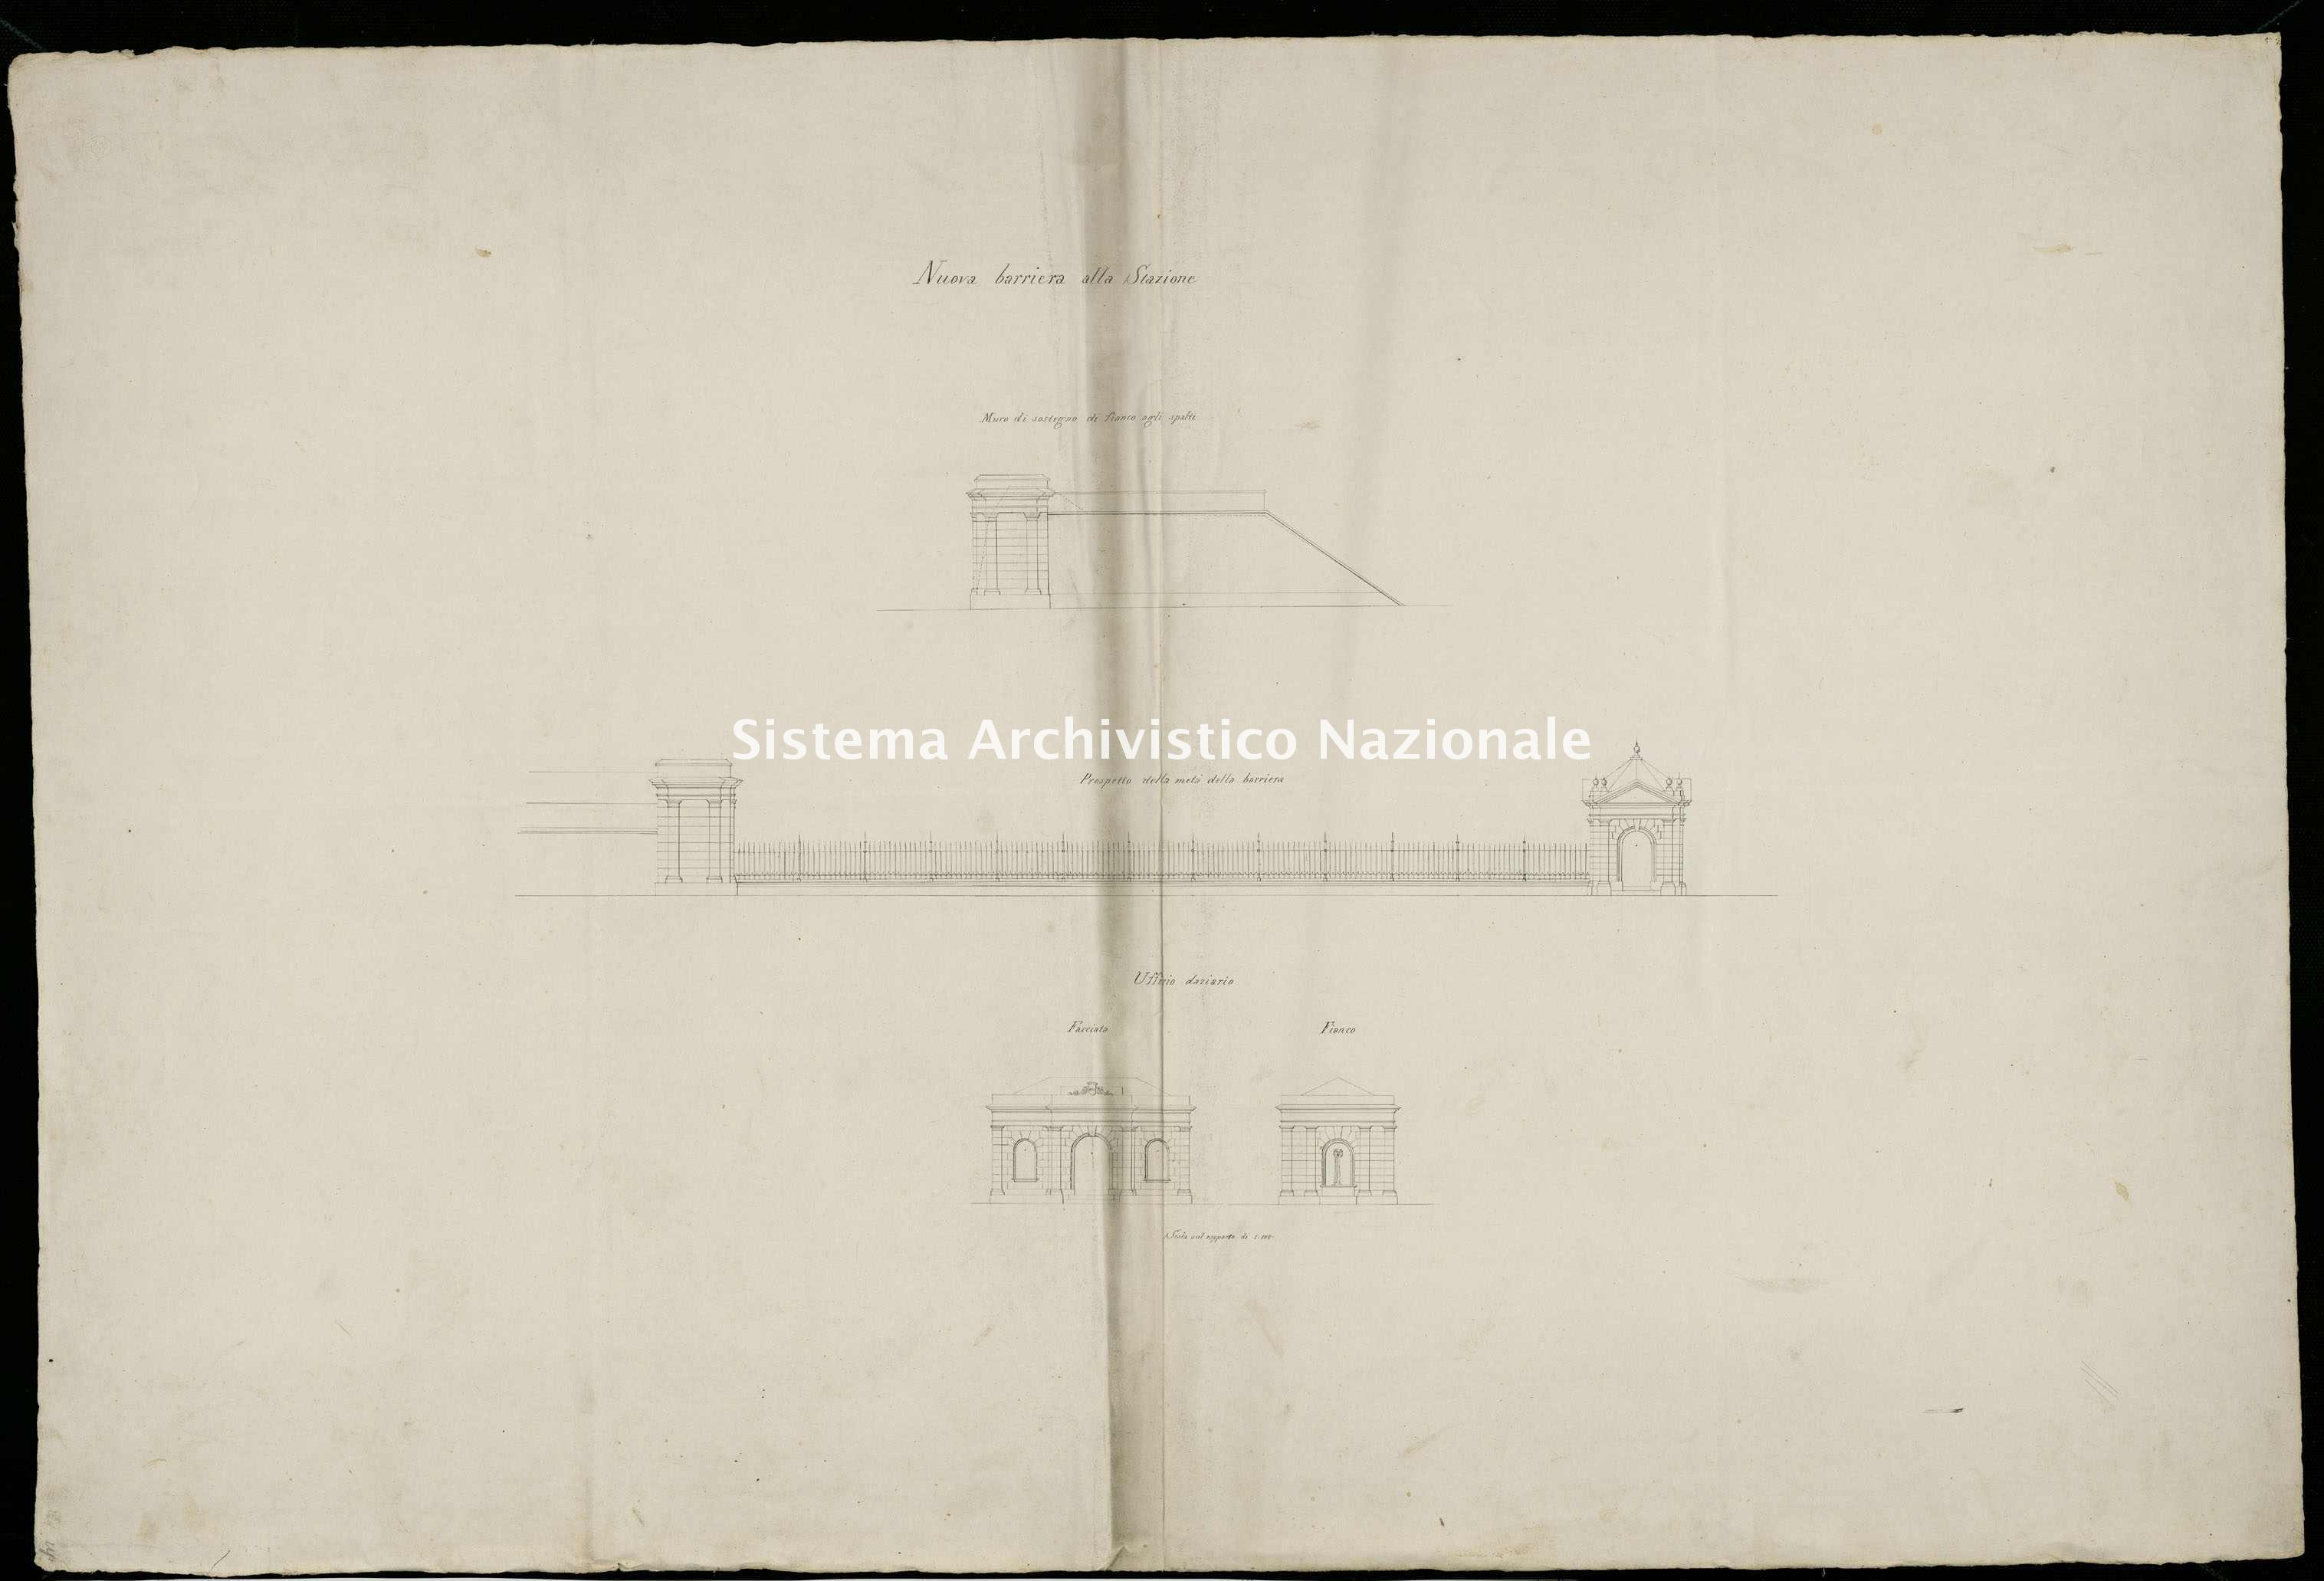 ASPC Mappe, stampe e disegni, n. 5184